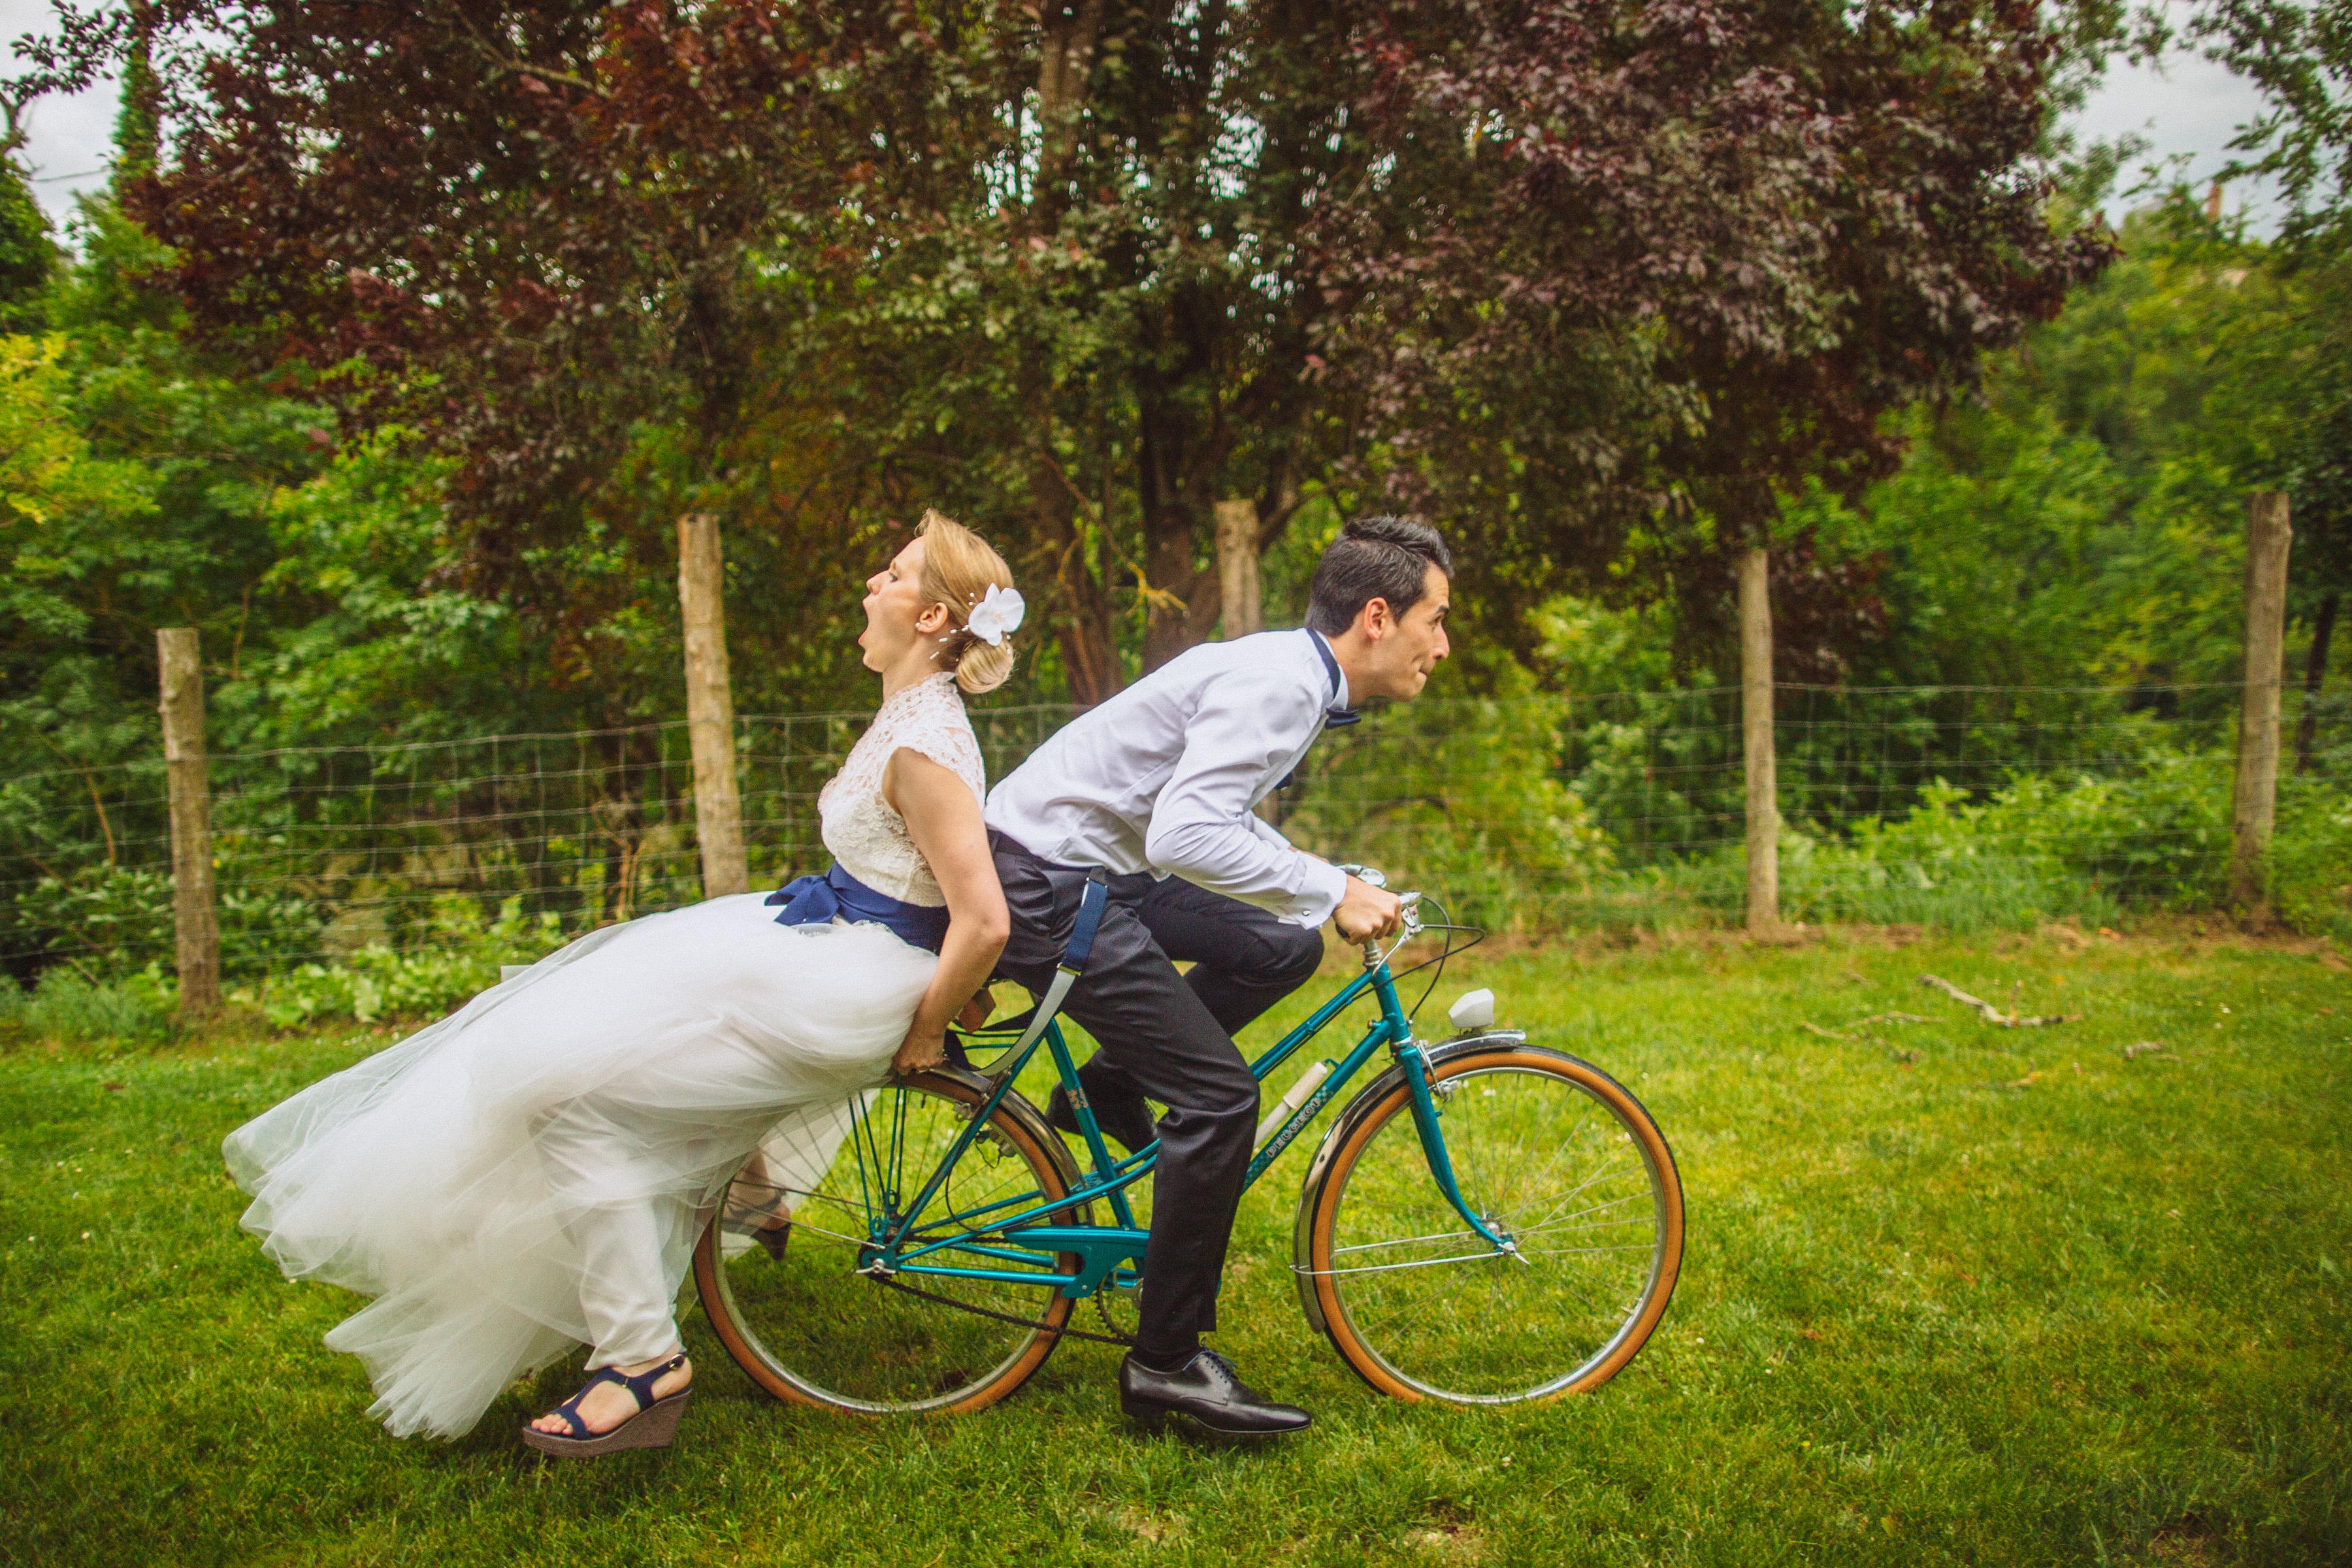 camille_nico___mariage_____ricardo_vieira_photographe_315